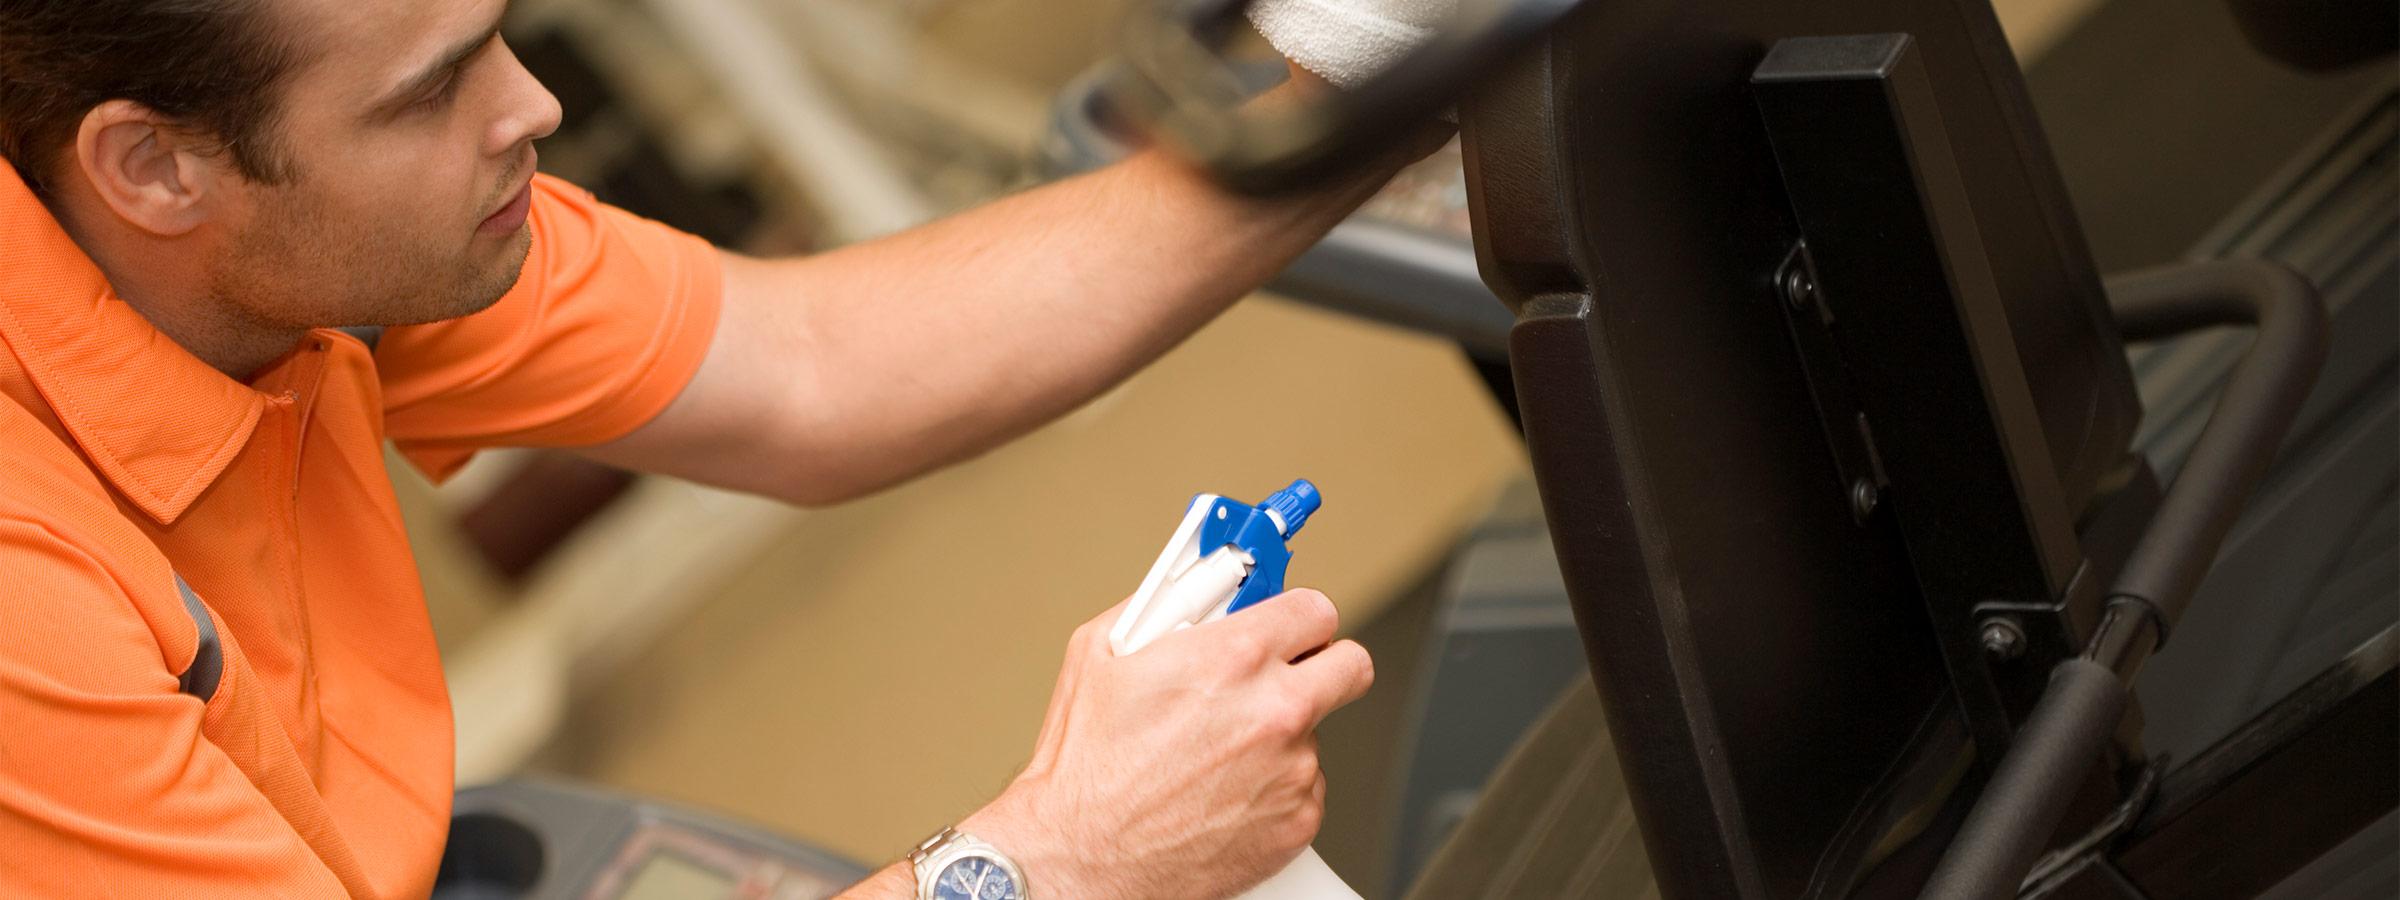 gym cleansing recipe image